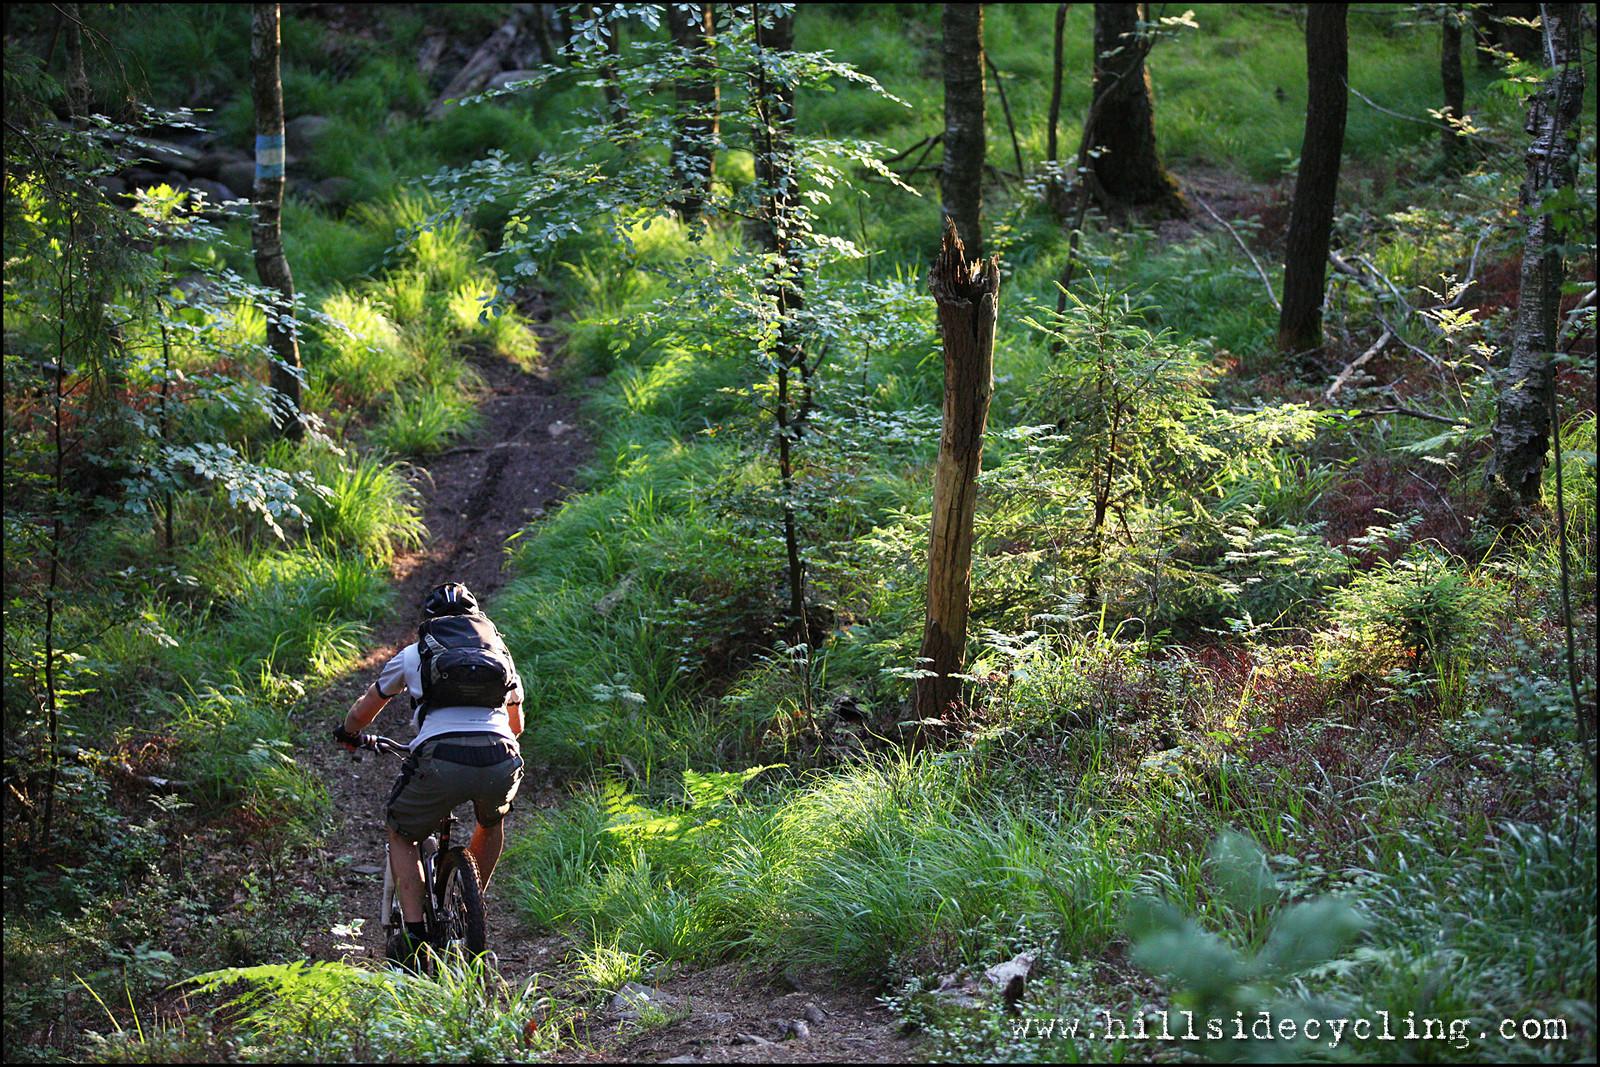 Black Beast Trail - Hillside Cycling - Mountain Biking Pictures - Vital MTB